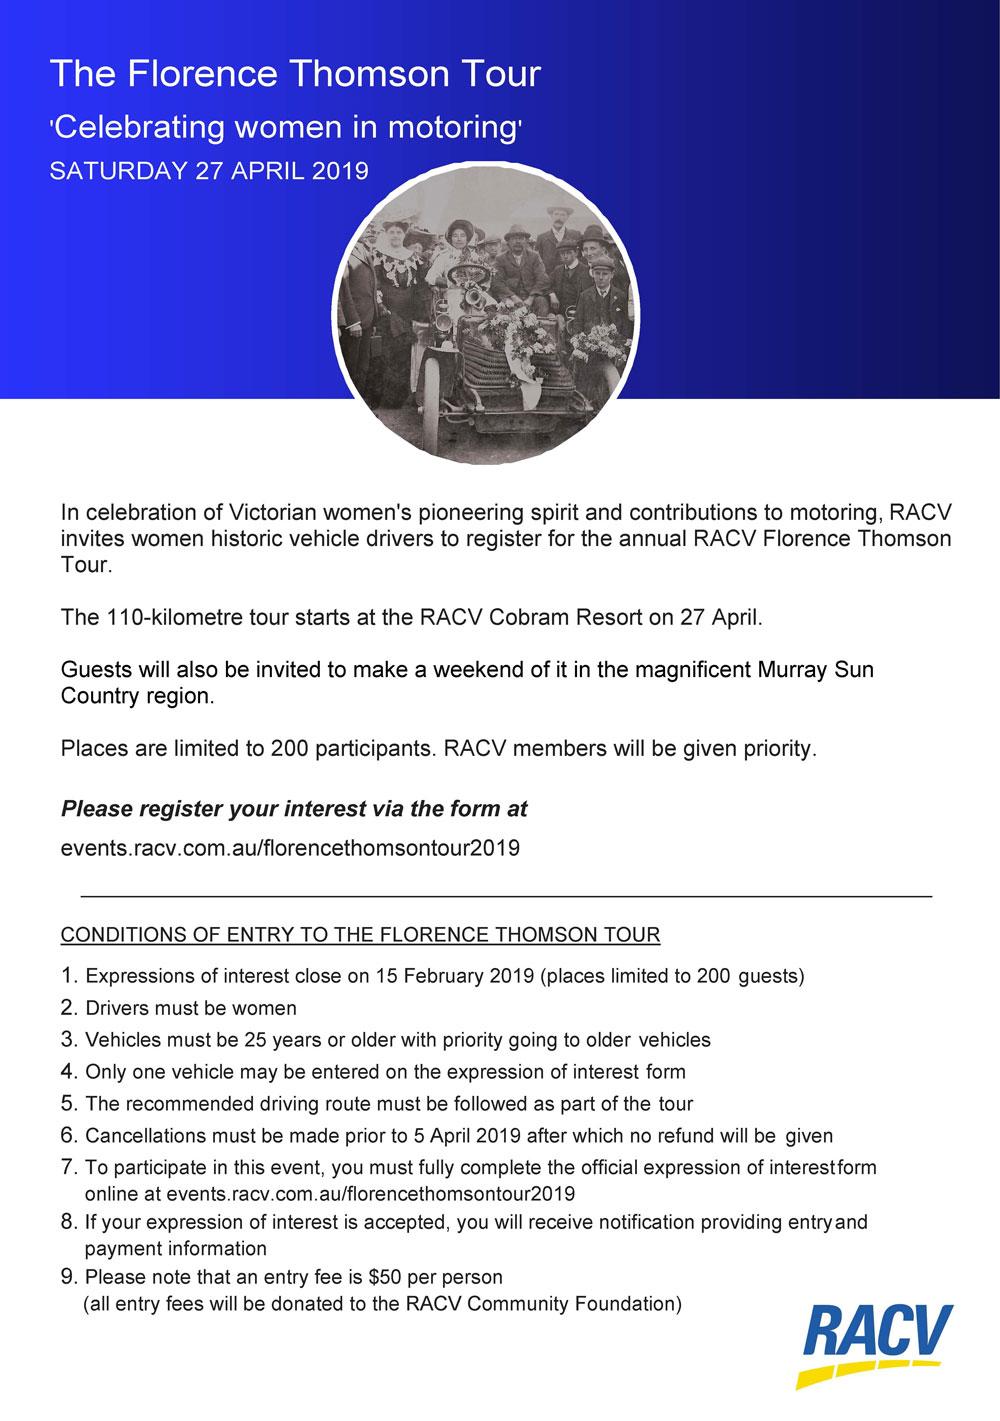 Florence-Thomson-Tour-EOI-form-2019-v2.jpg